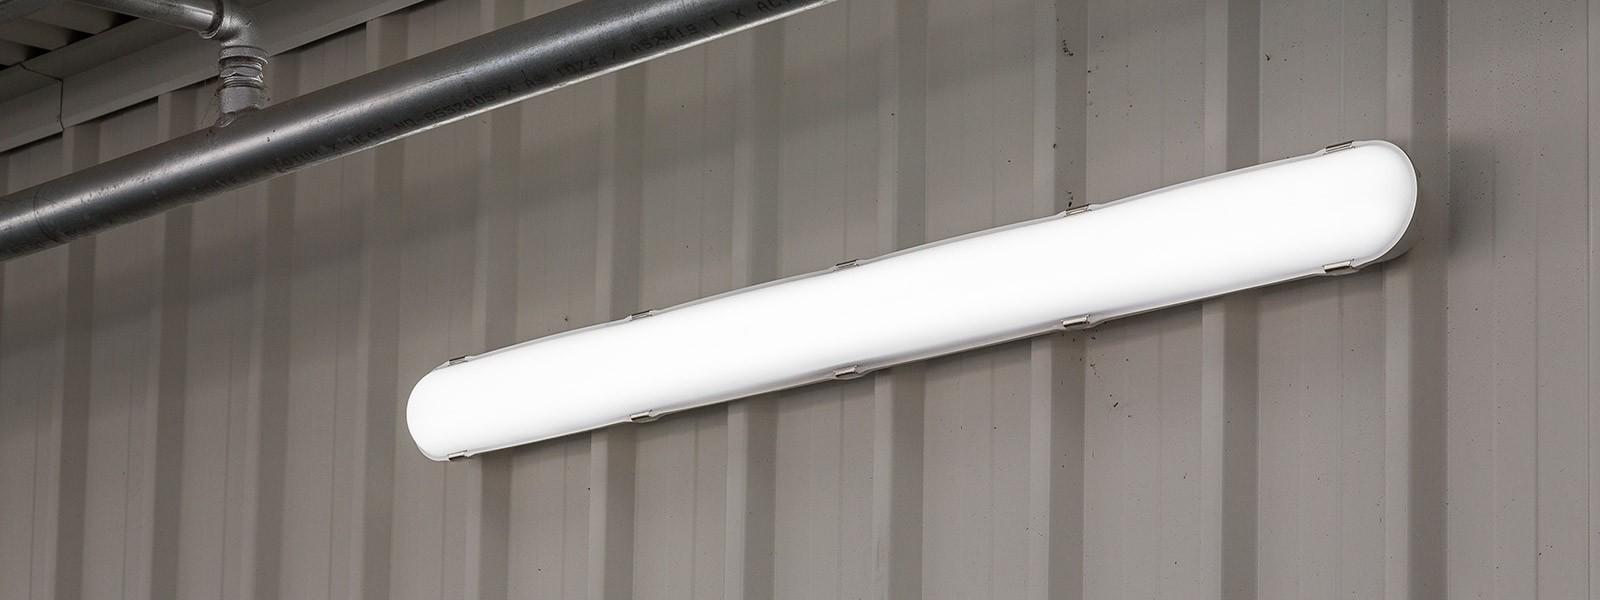 ROBUS energy saving luminaires